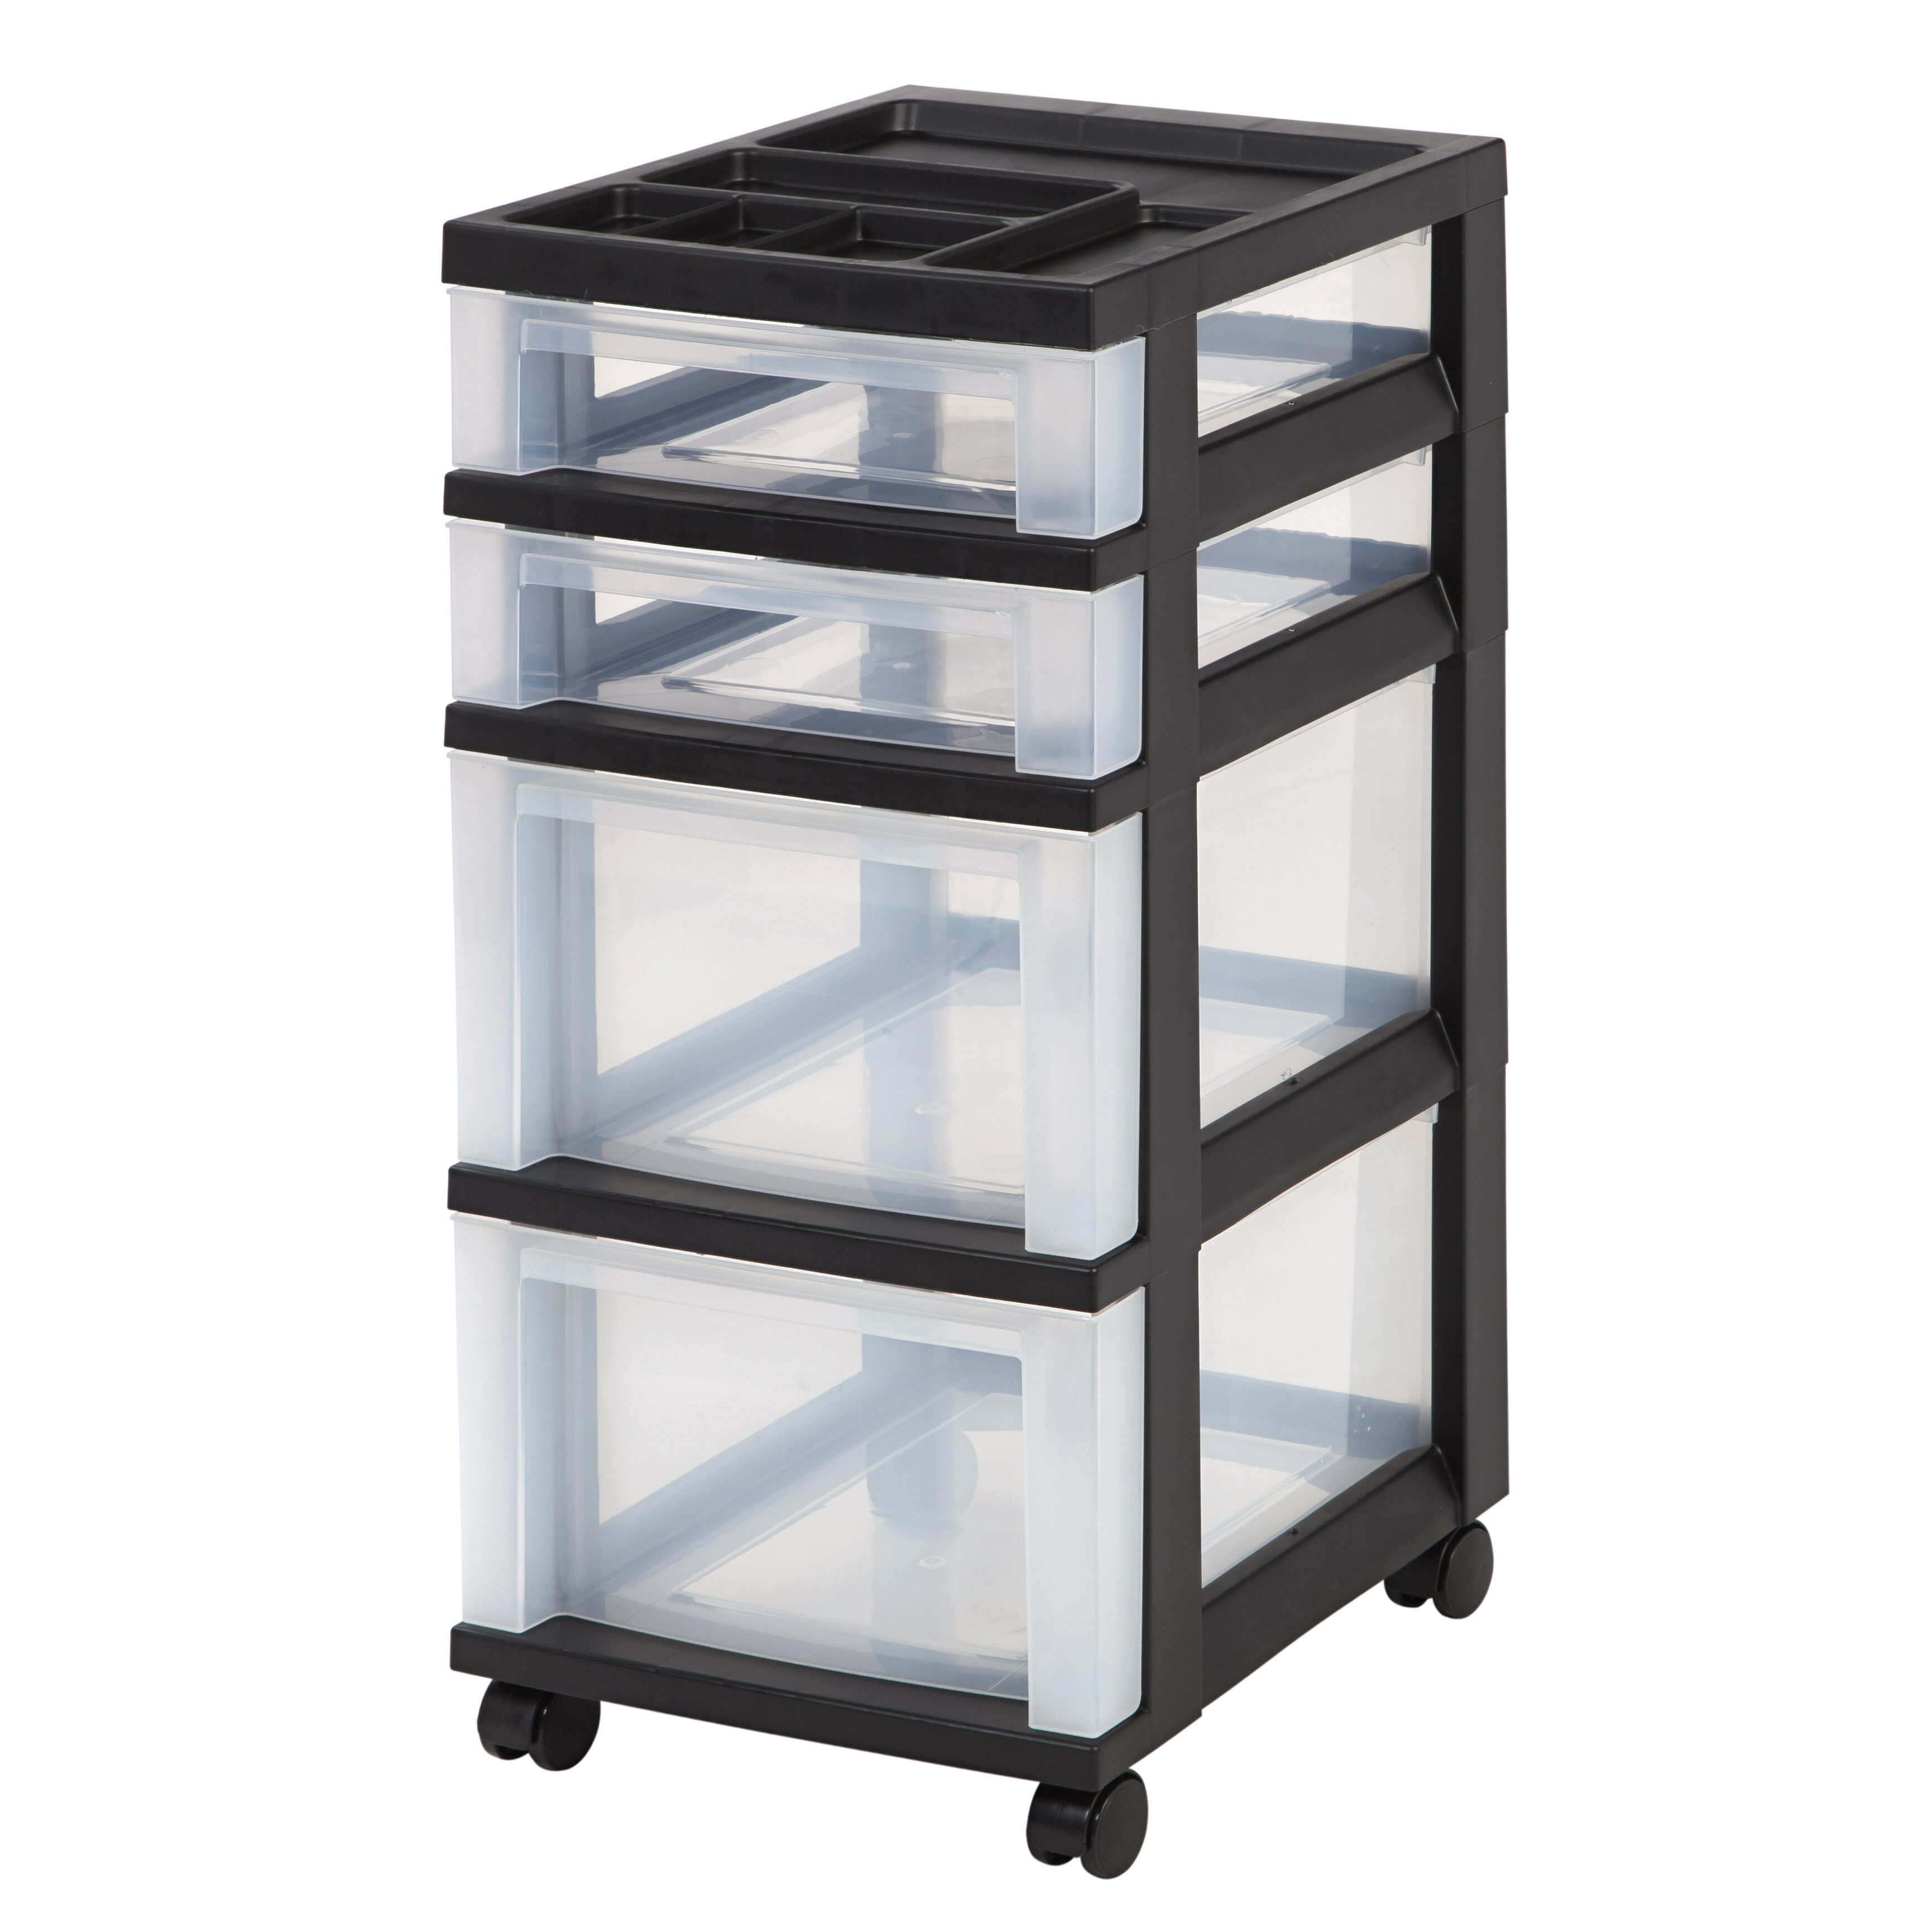 wayfair basics 4 drawer storage chest reviews wayfair. Black Bedroom Furniture Sets. Home Design Ideas